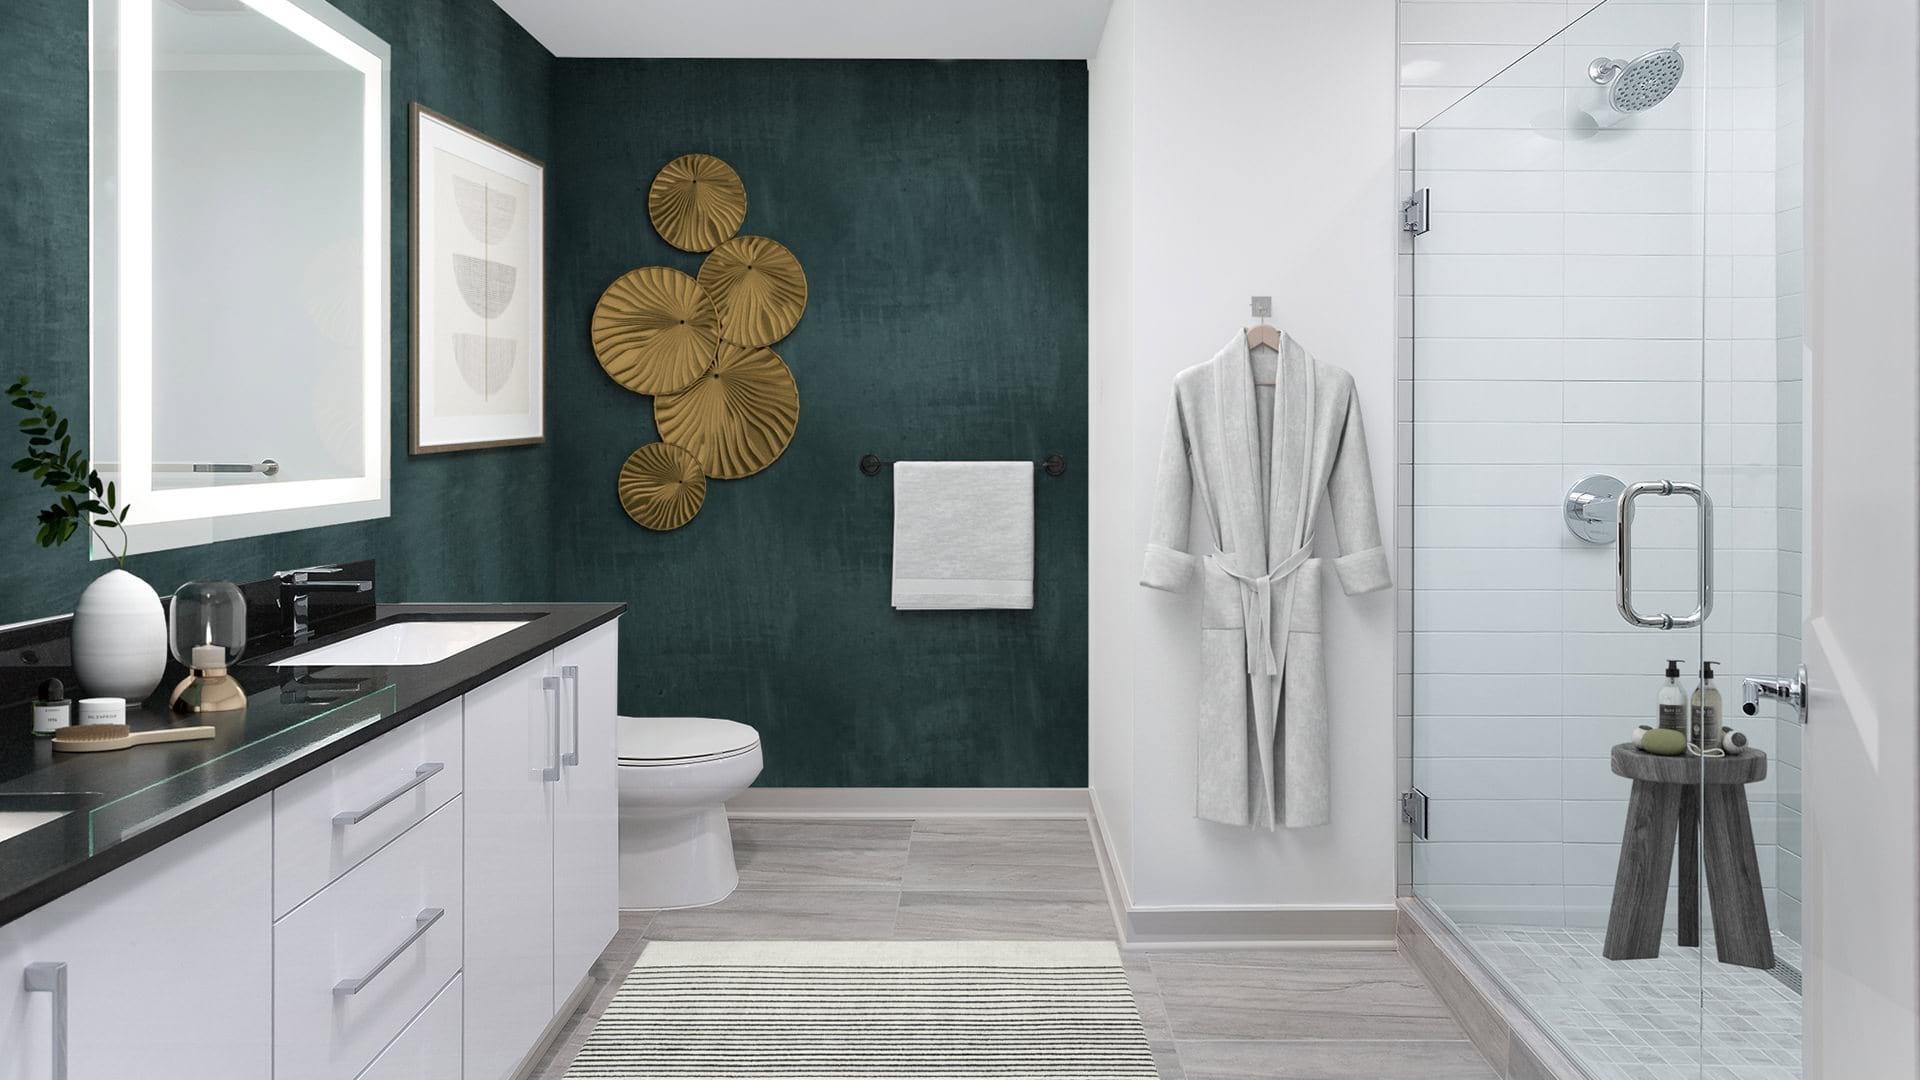 Halo-Lit Mirrors & Standalone Showers